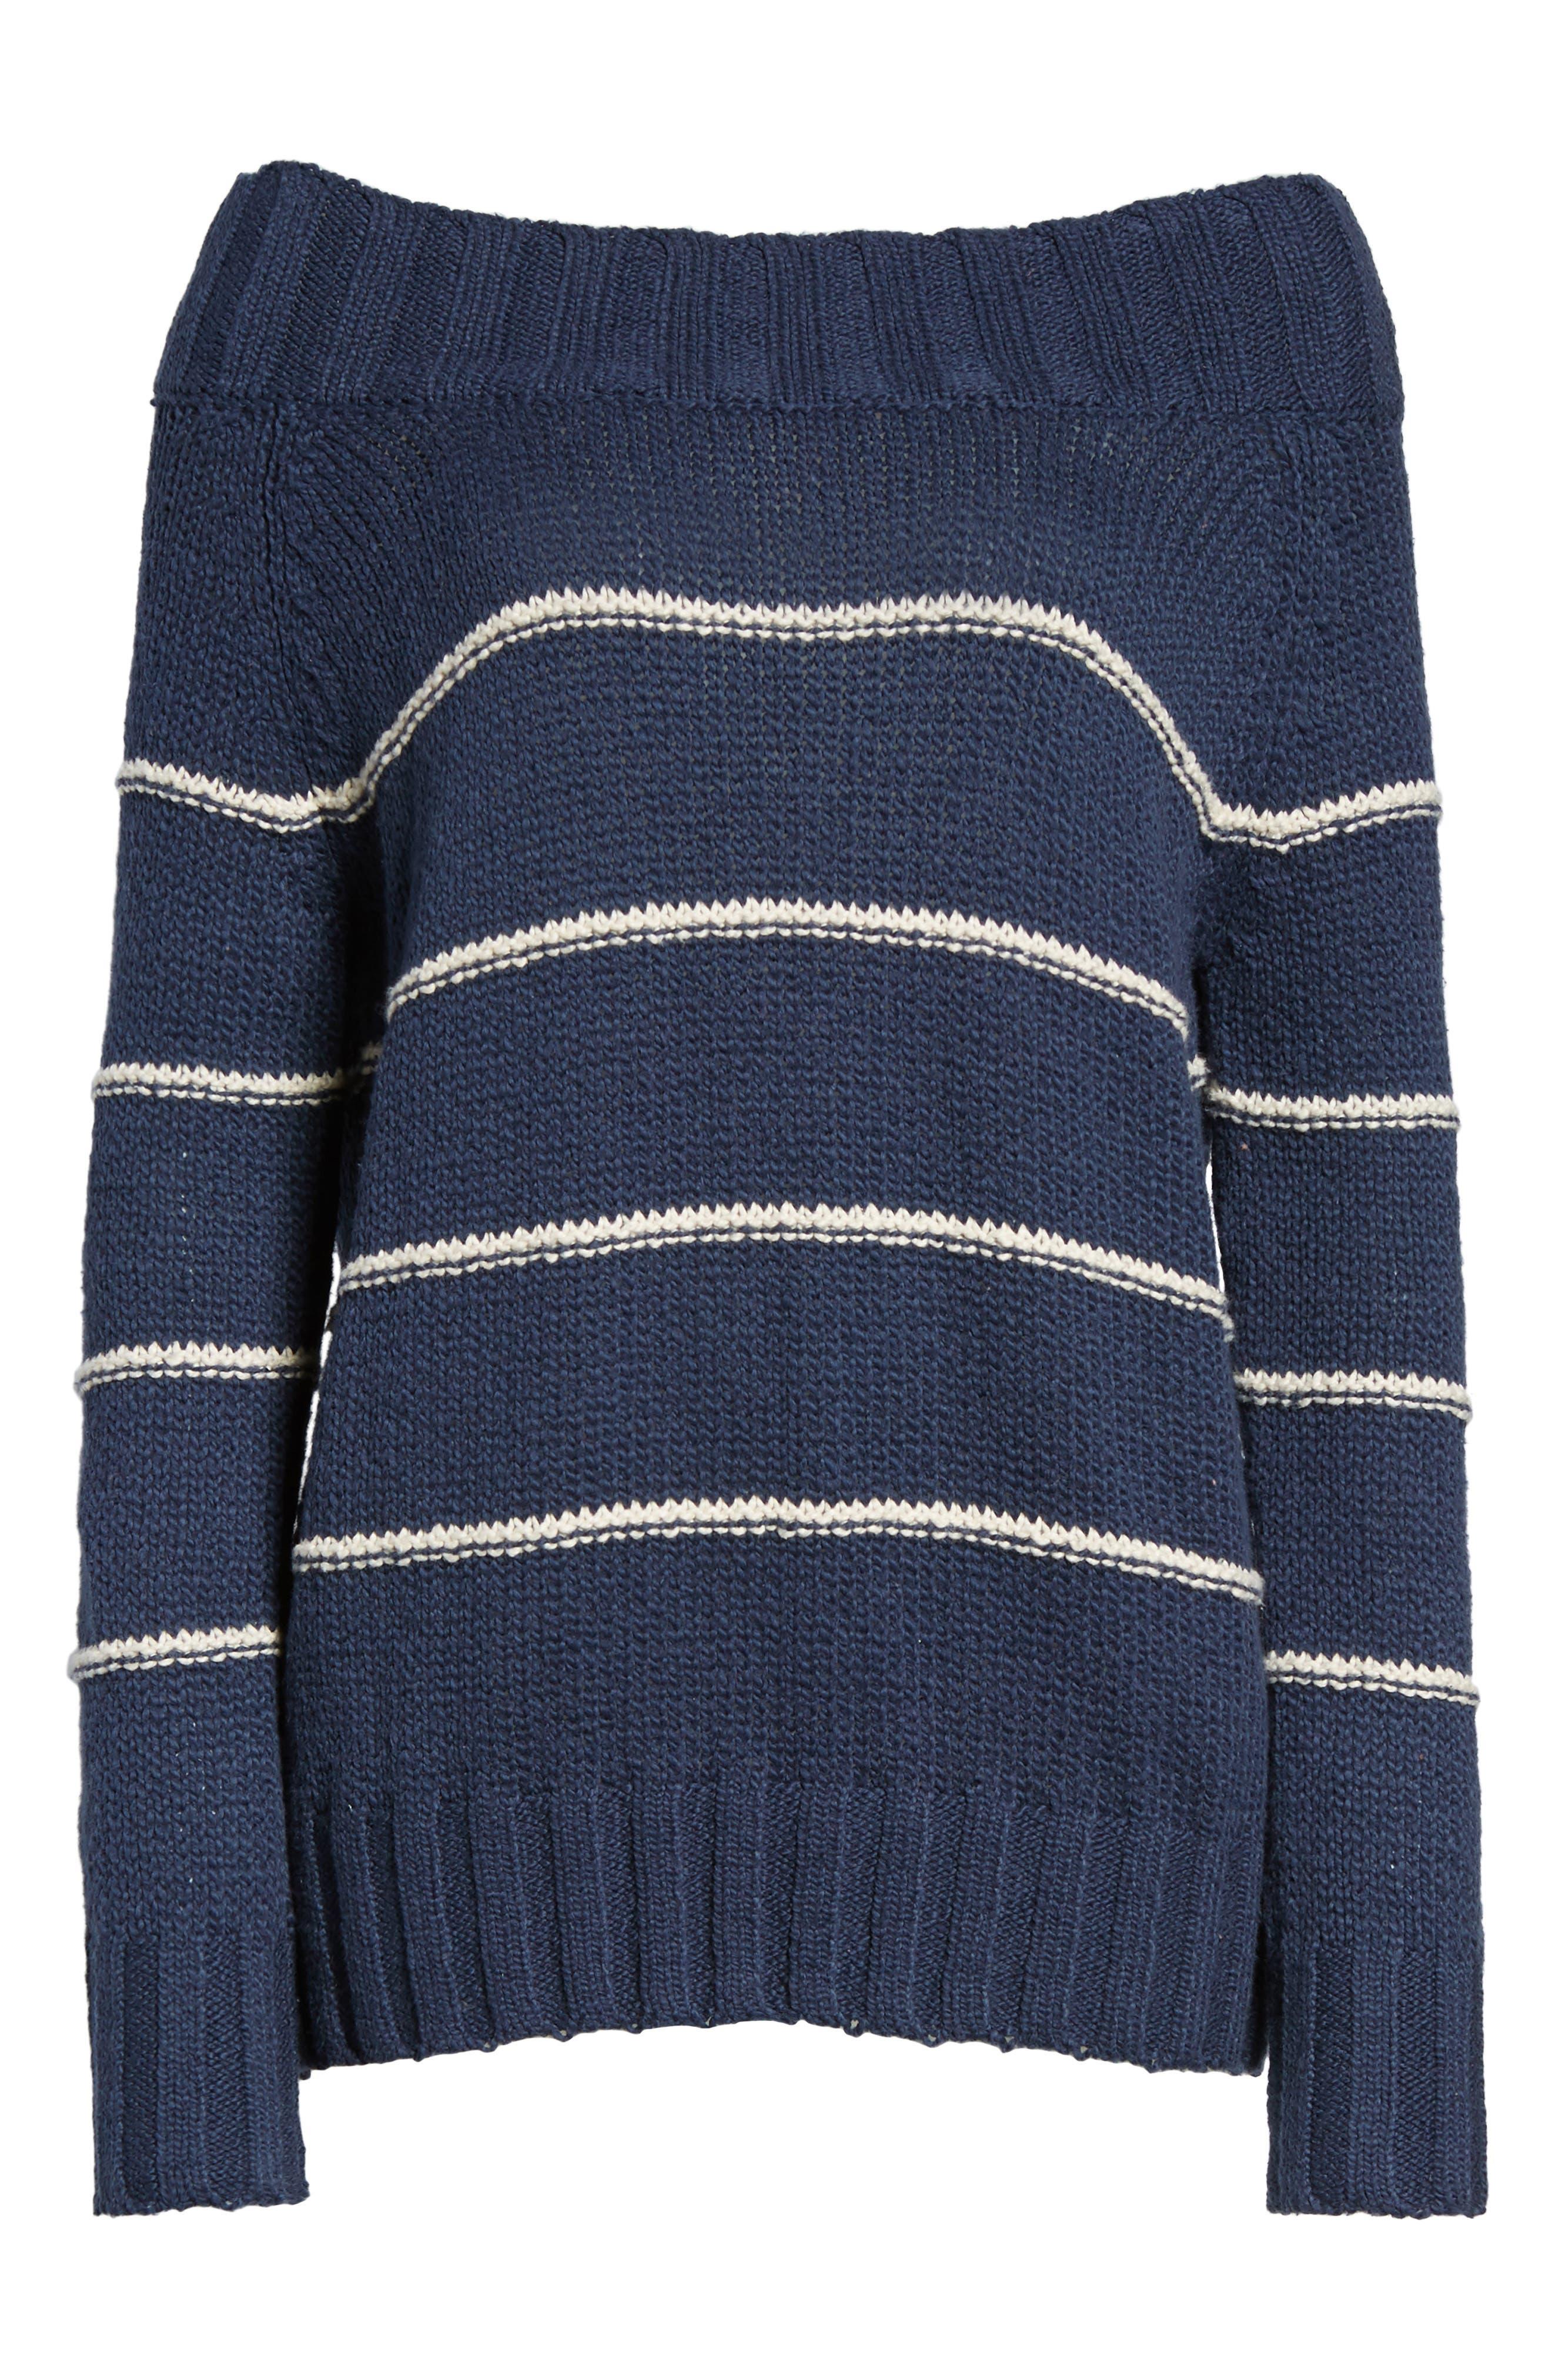 BILLABONG,                             Snuggle Down Off the Shoulder Sweater,                             Alternate thumbnail 6, color,                             400